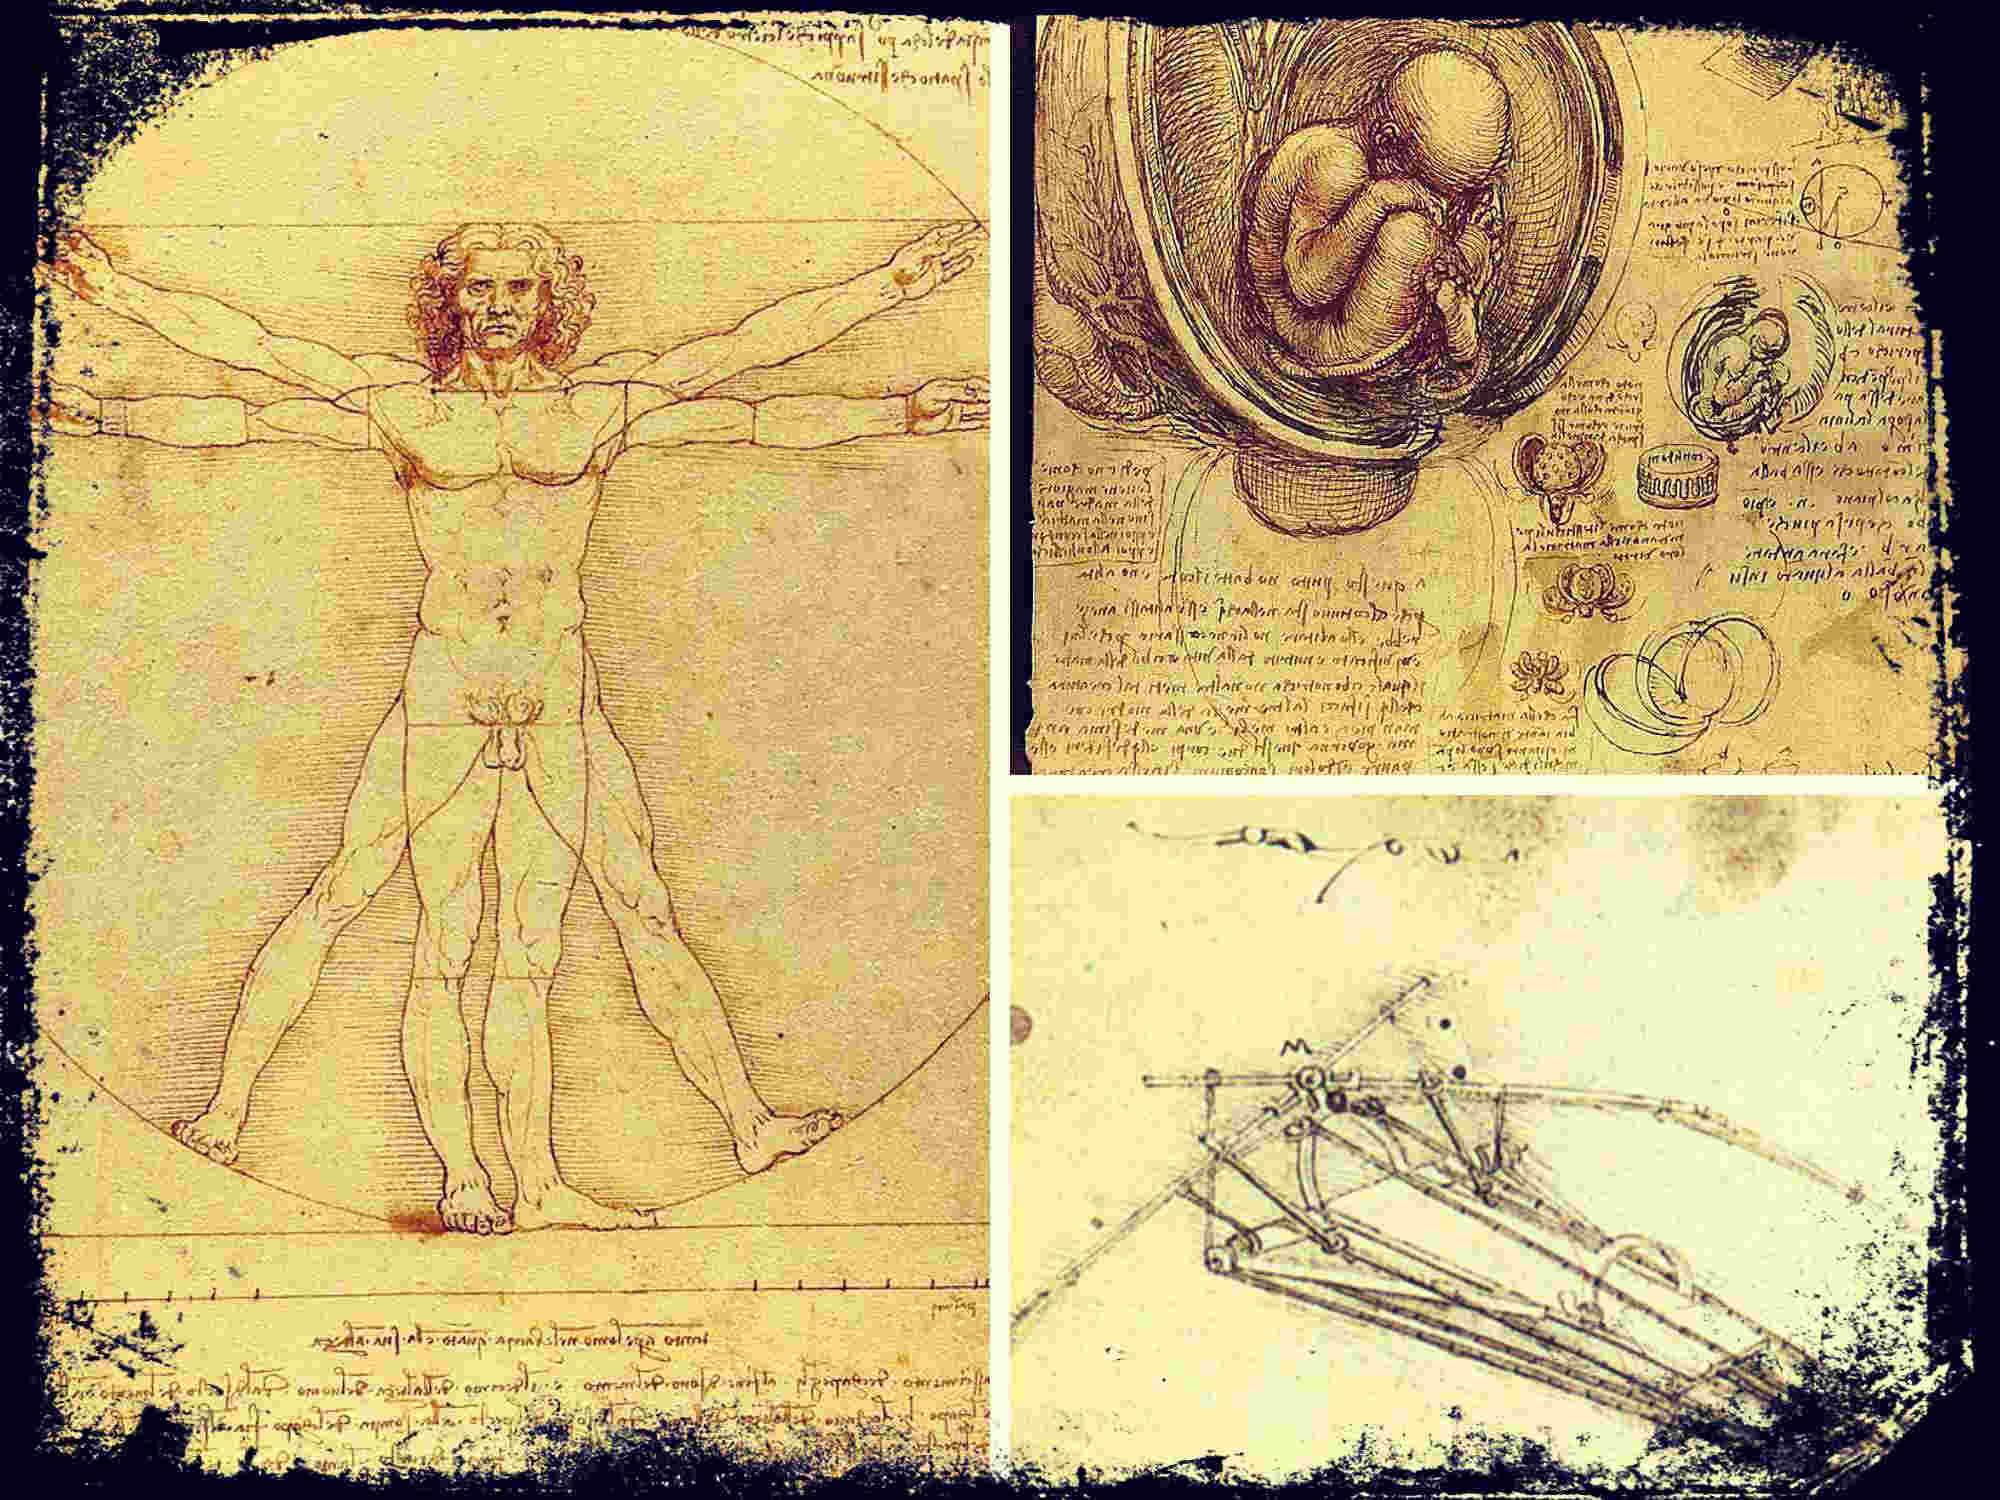 Da Vinci, el Verdadero poder de la genialidad humana